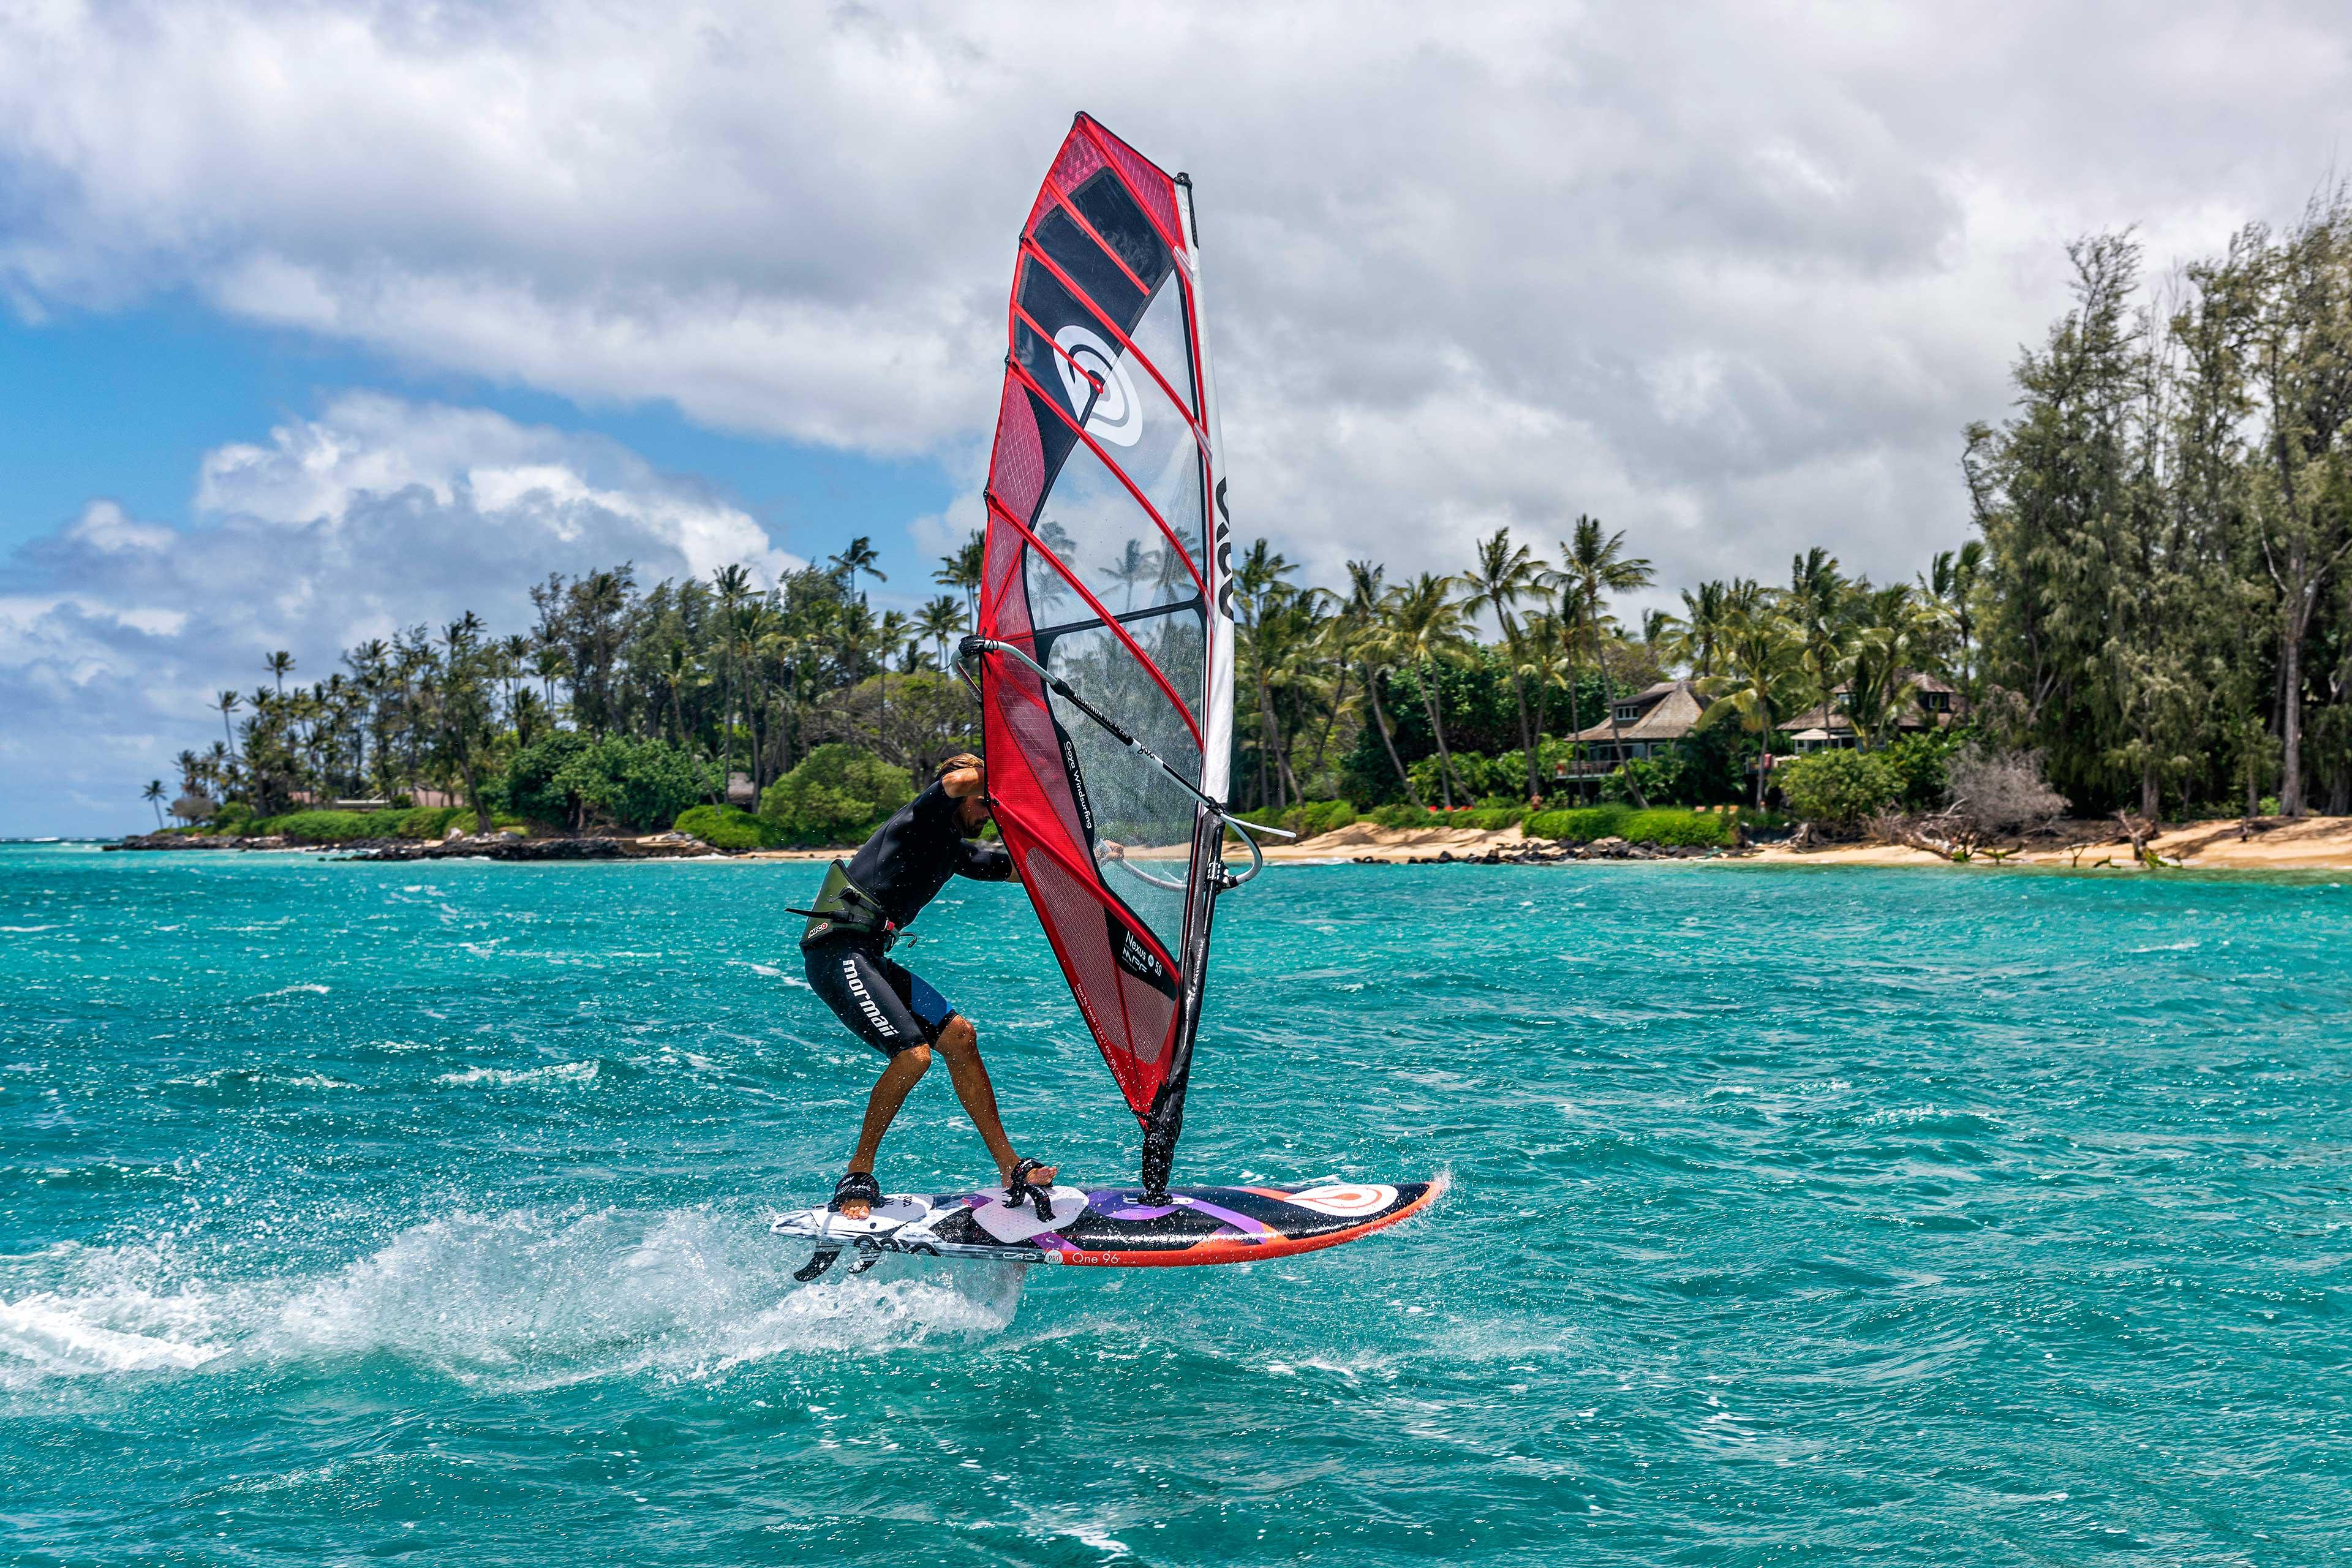 Goya Windsurfing - Booms - Slim